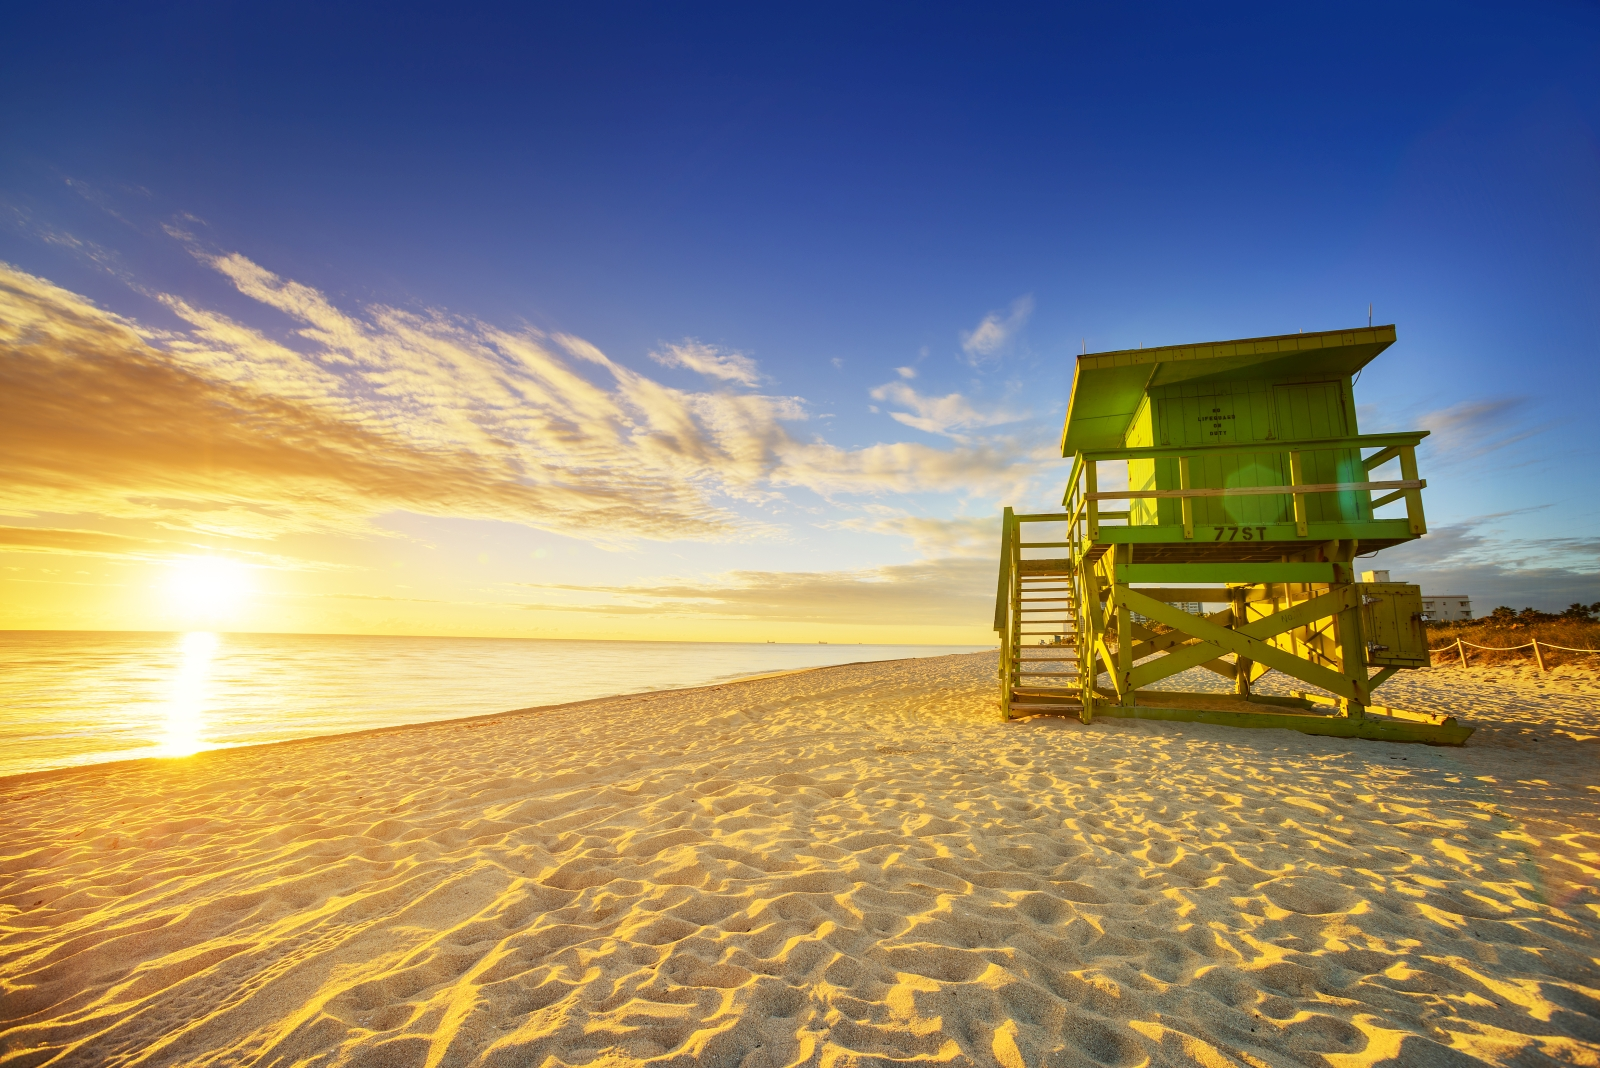 checkliste f r den strandurlaub in den usa. Black Bedroom Furniture Sets. Home Design Ideas